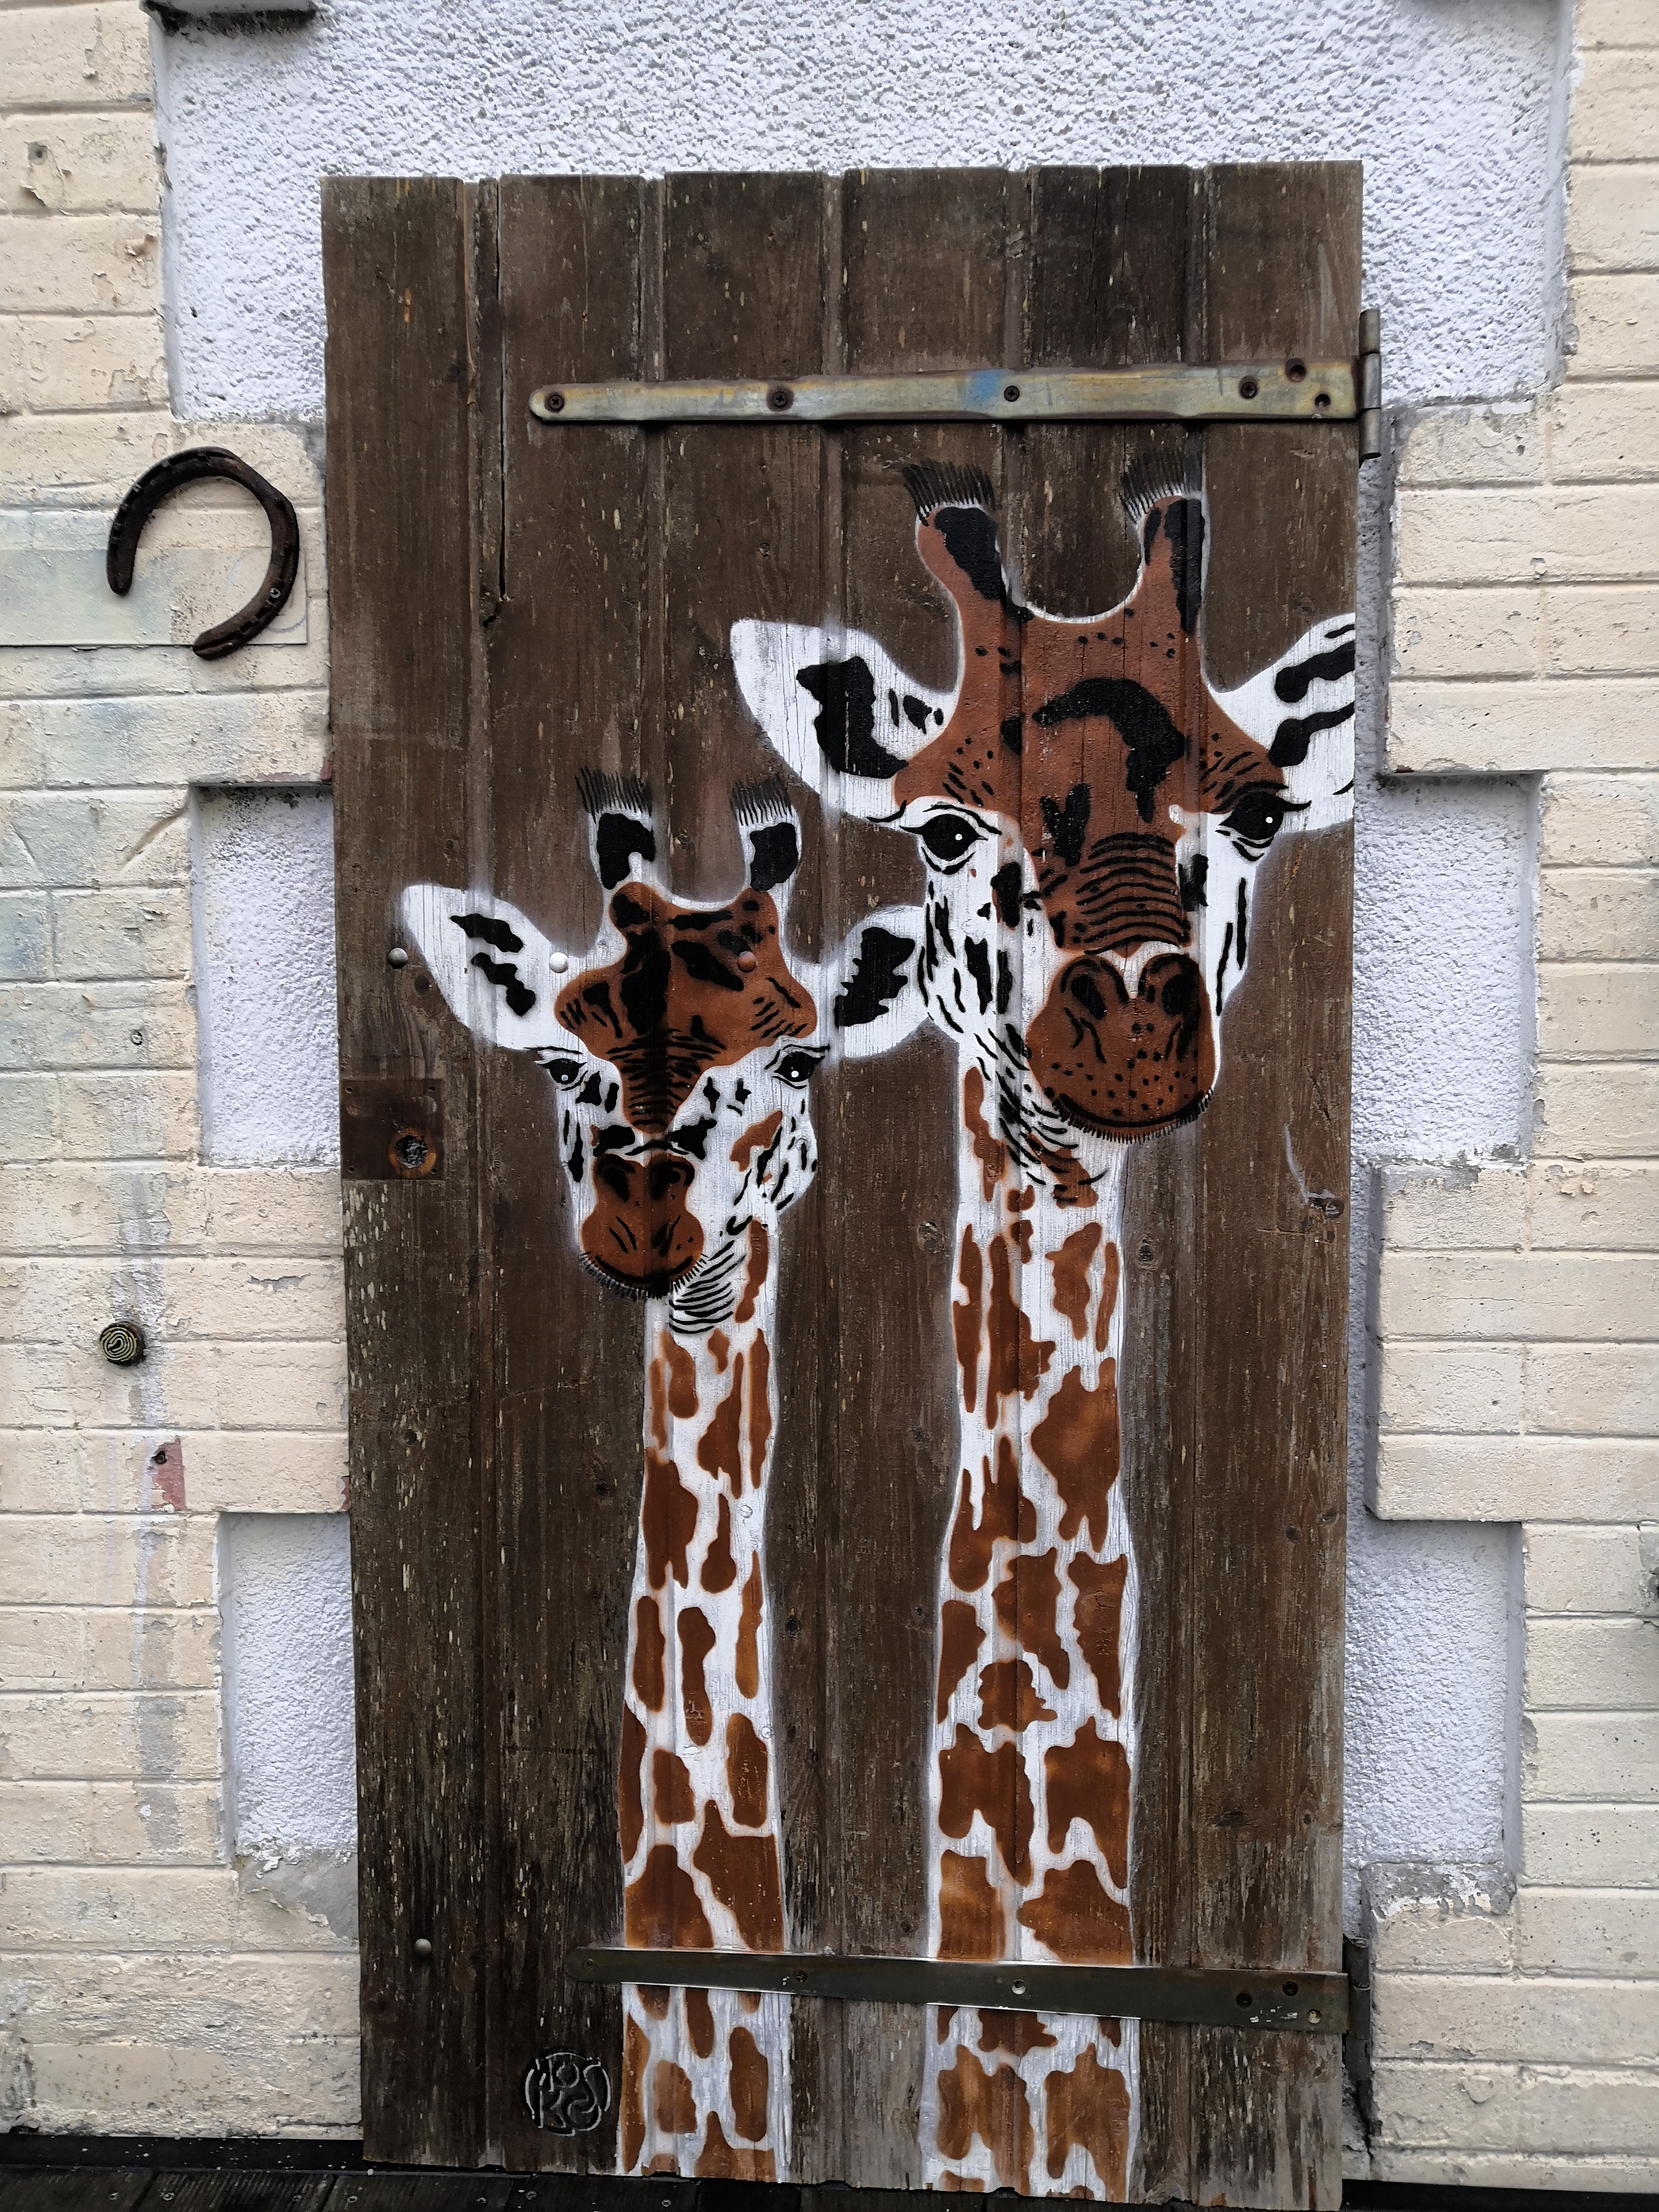 Mosko _ Deux girafes 2015